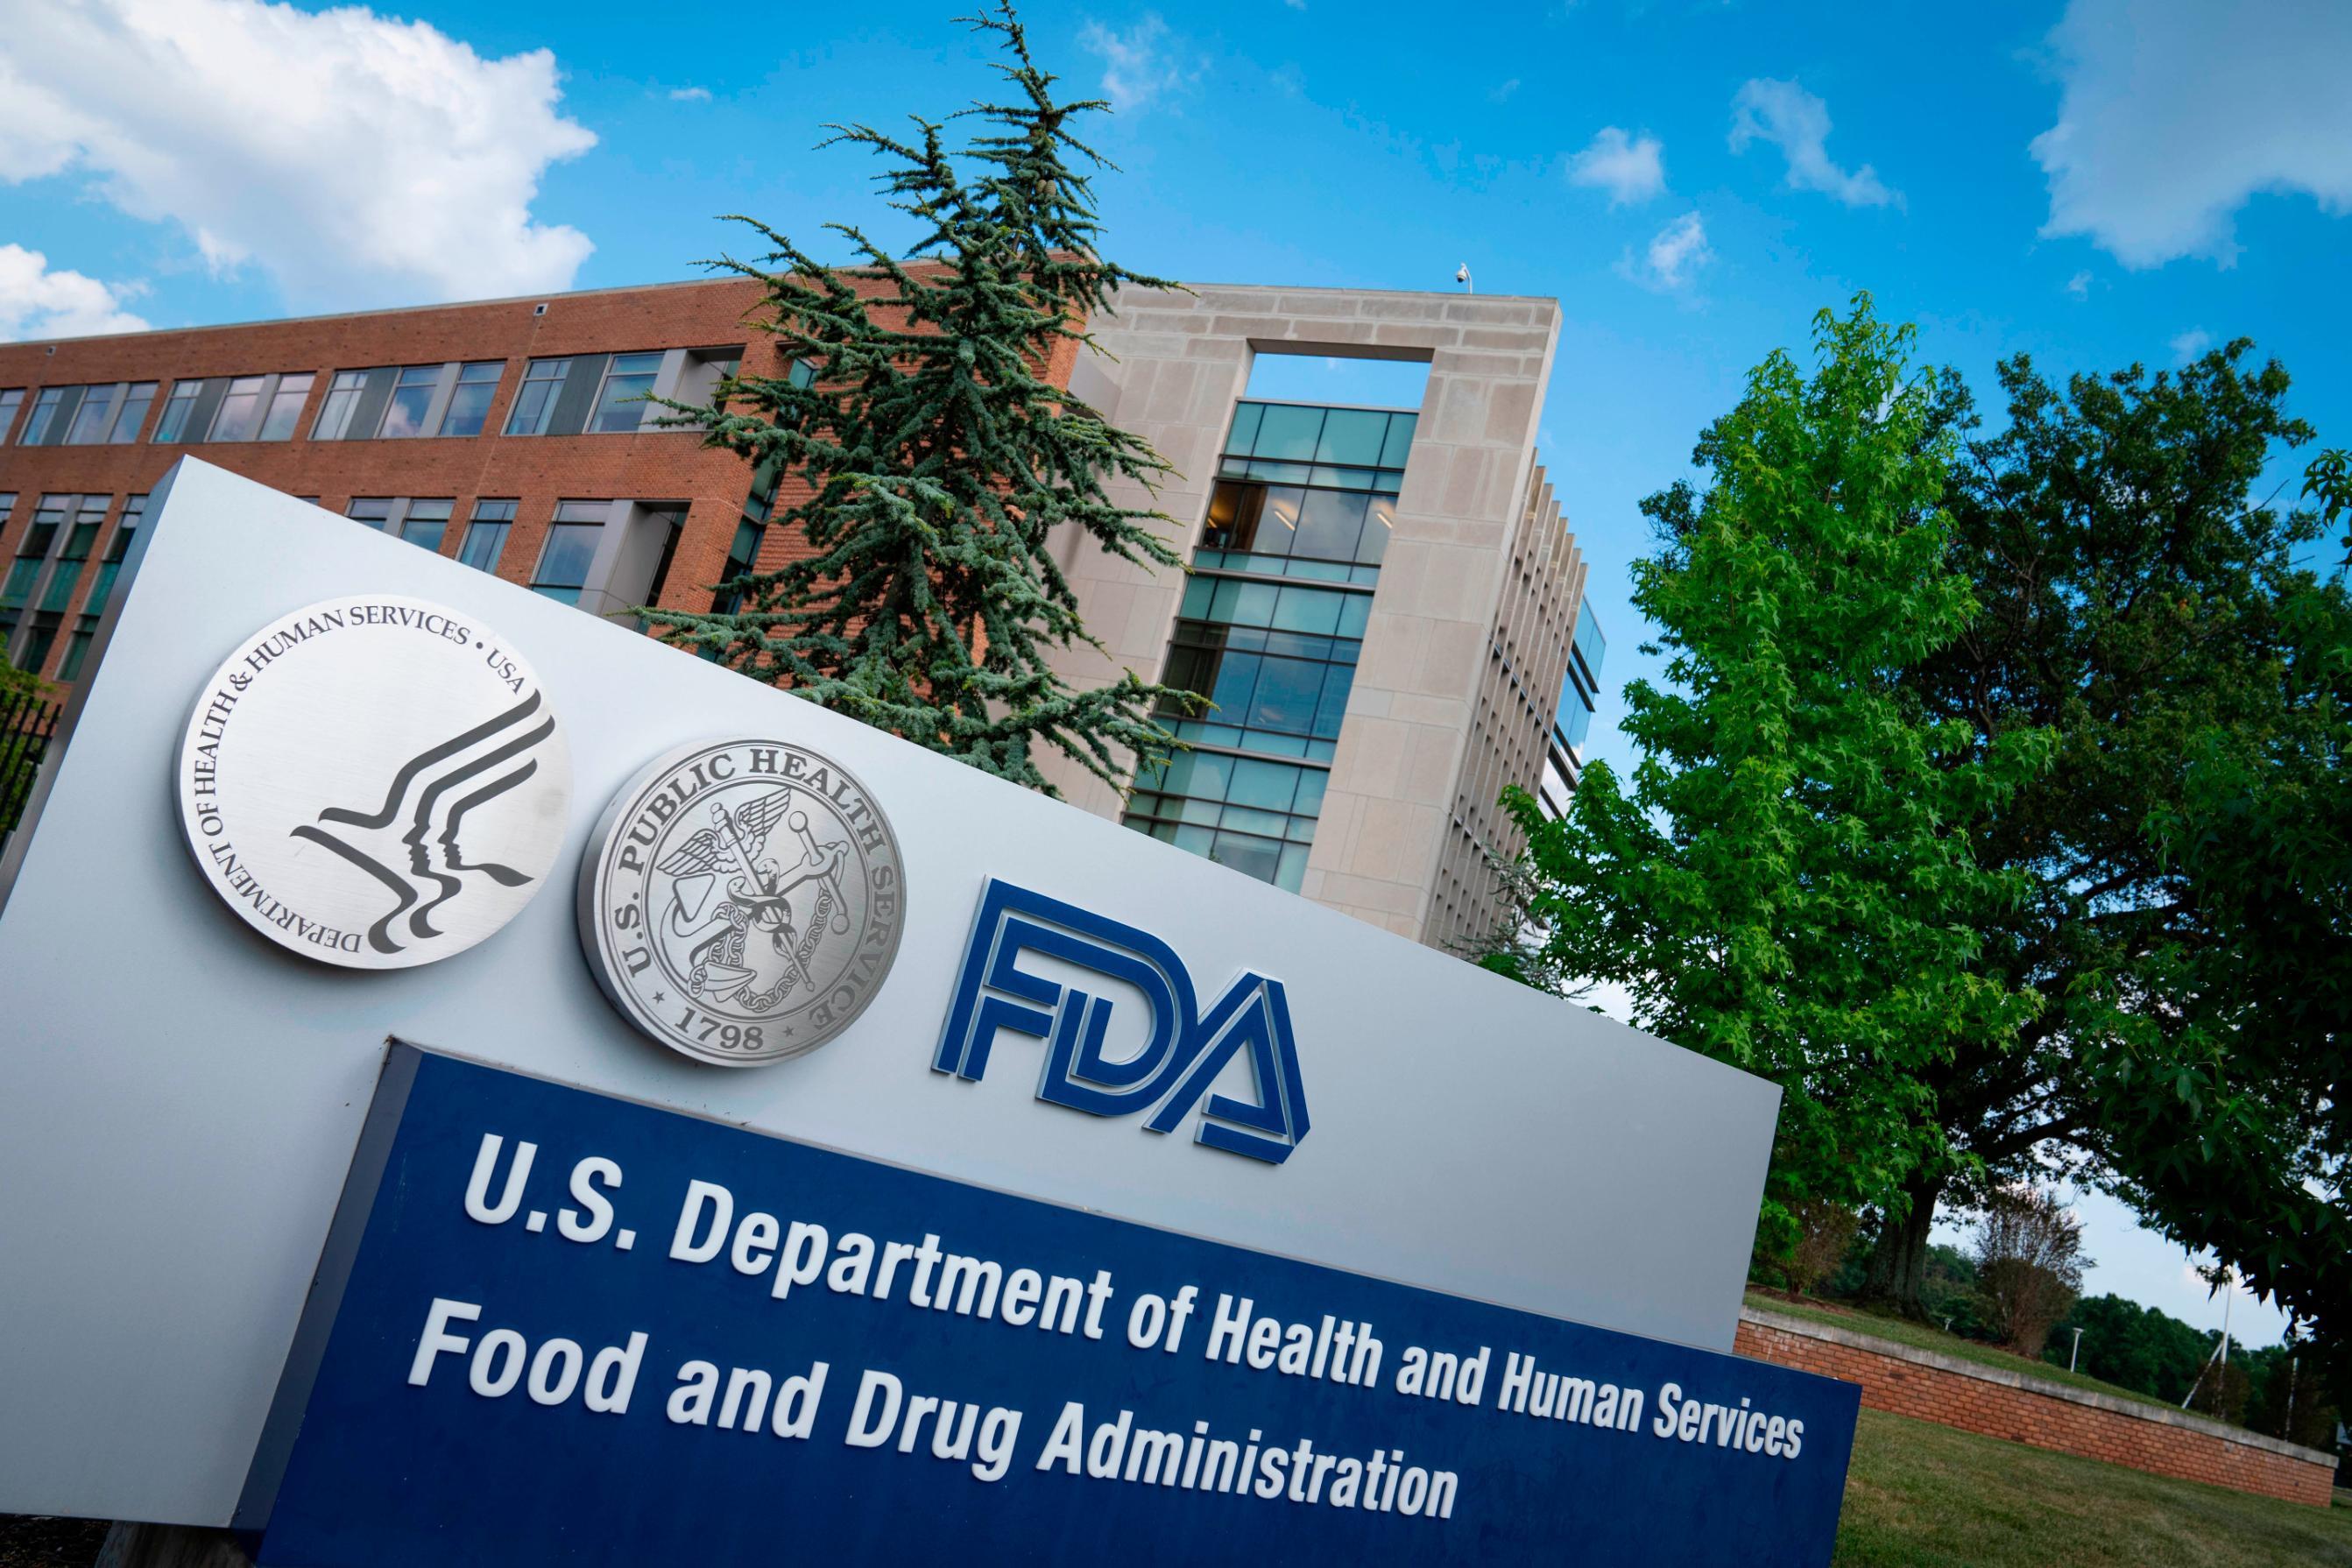 Acting FDA commissioner calls for independent investigation into approval of Alzheimer's drug